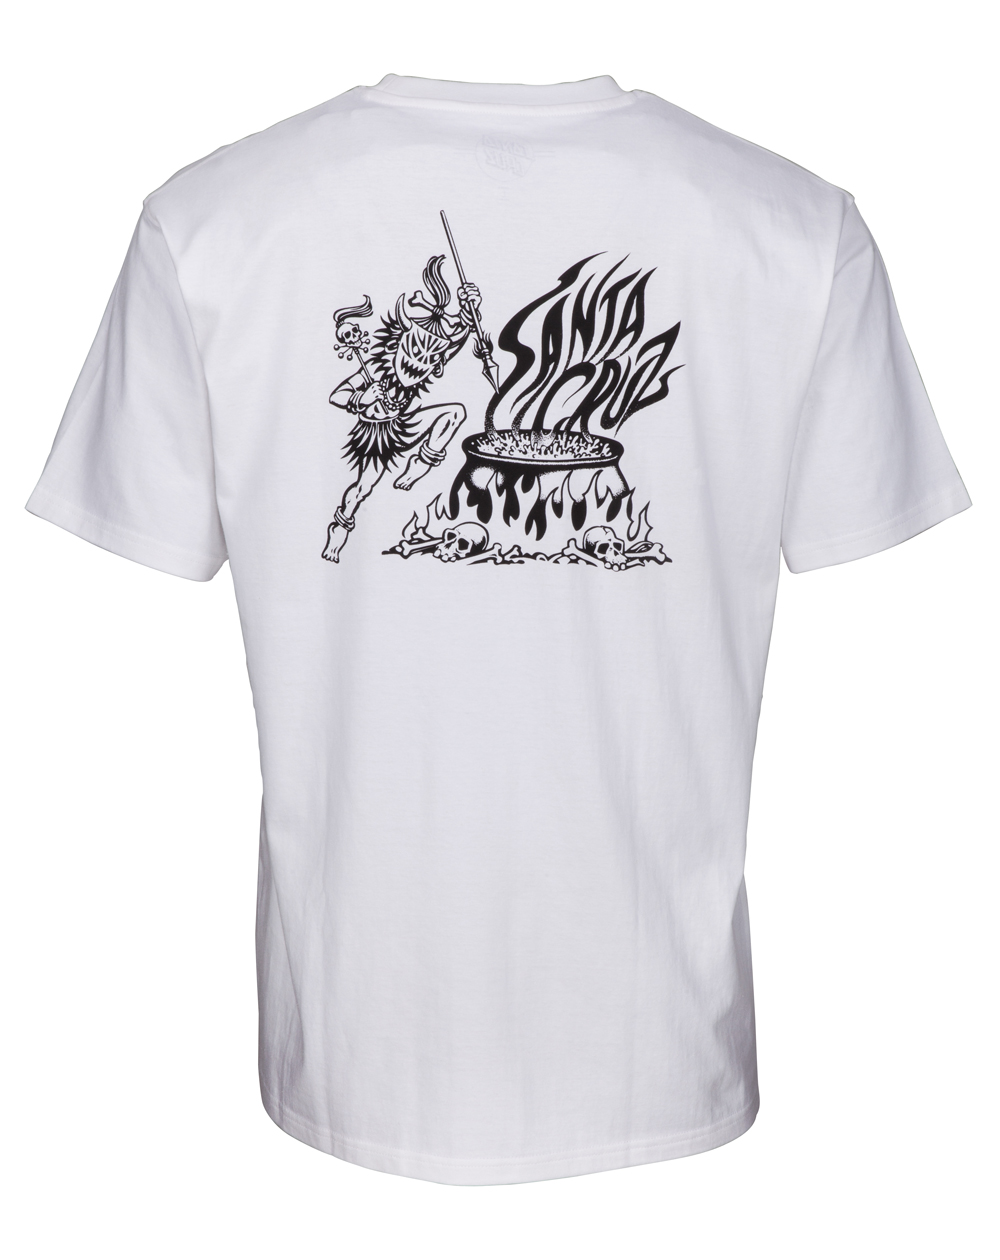 Santa Cruz Salba Witch Doctor T-Shirt Homme White